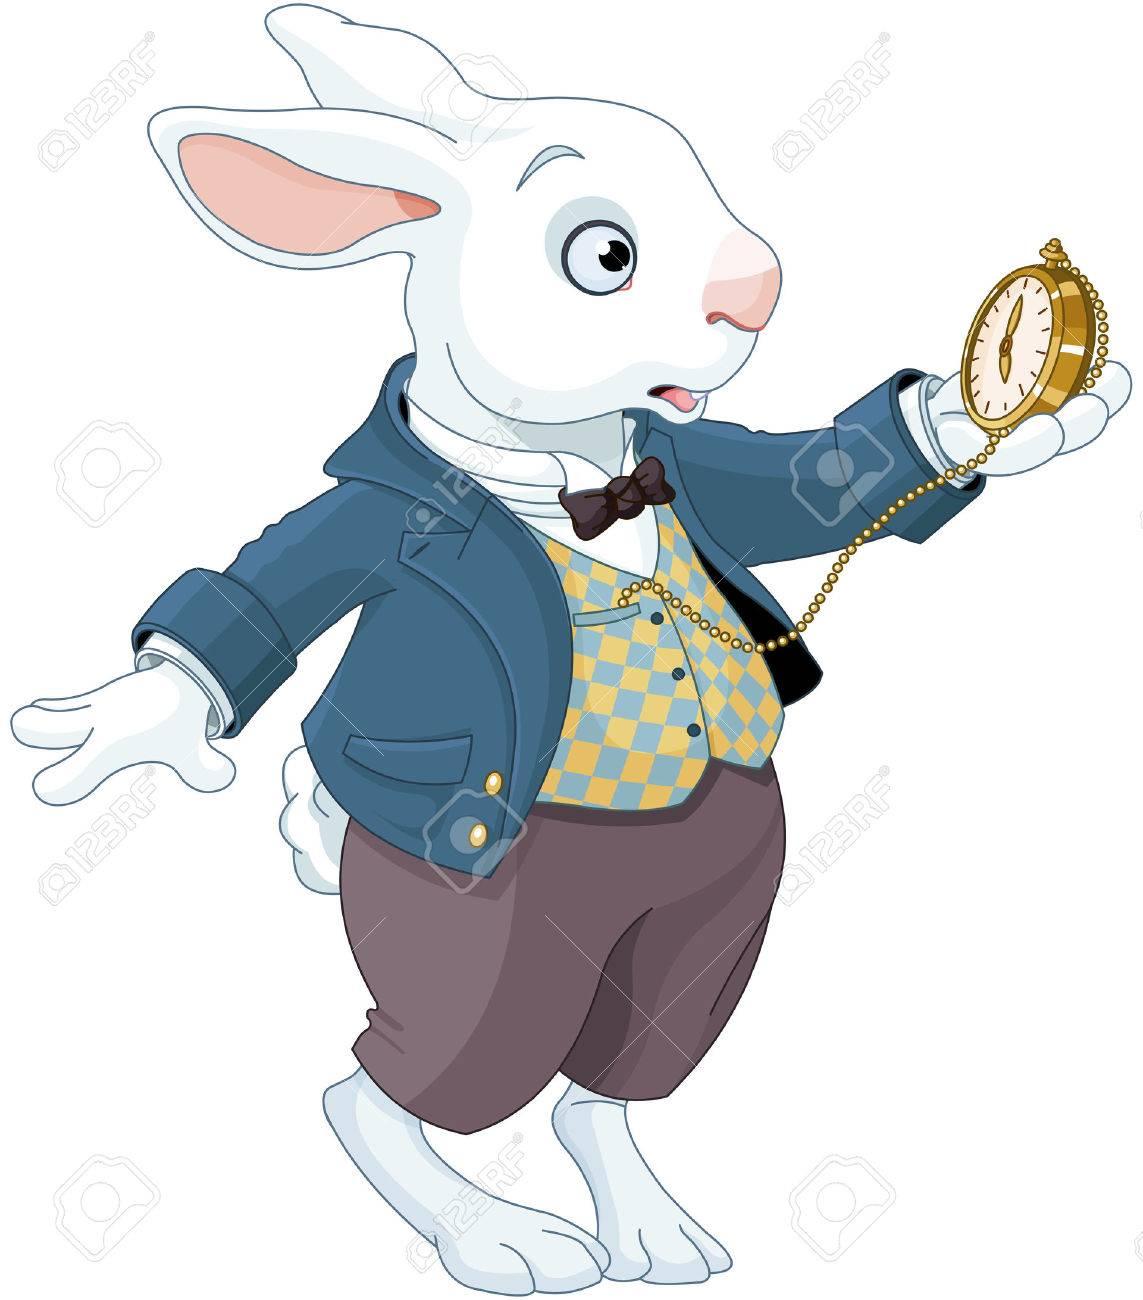 Illustration of white rabbit holds watch - 82157557